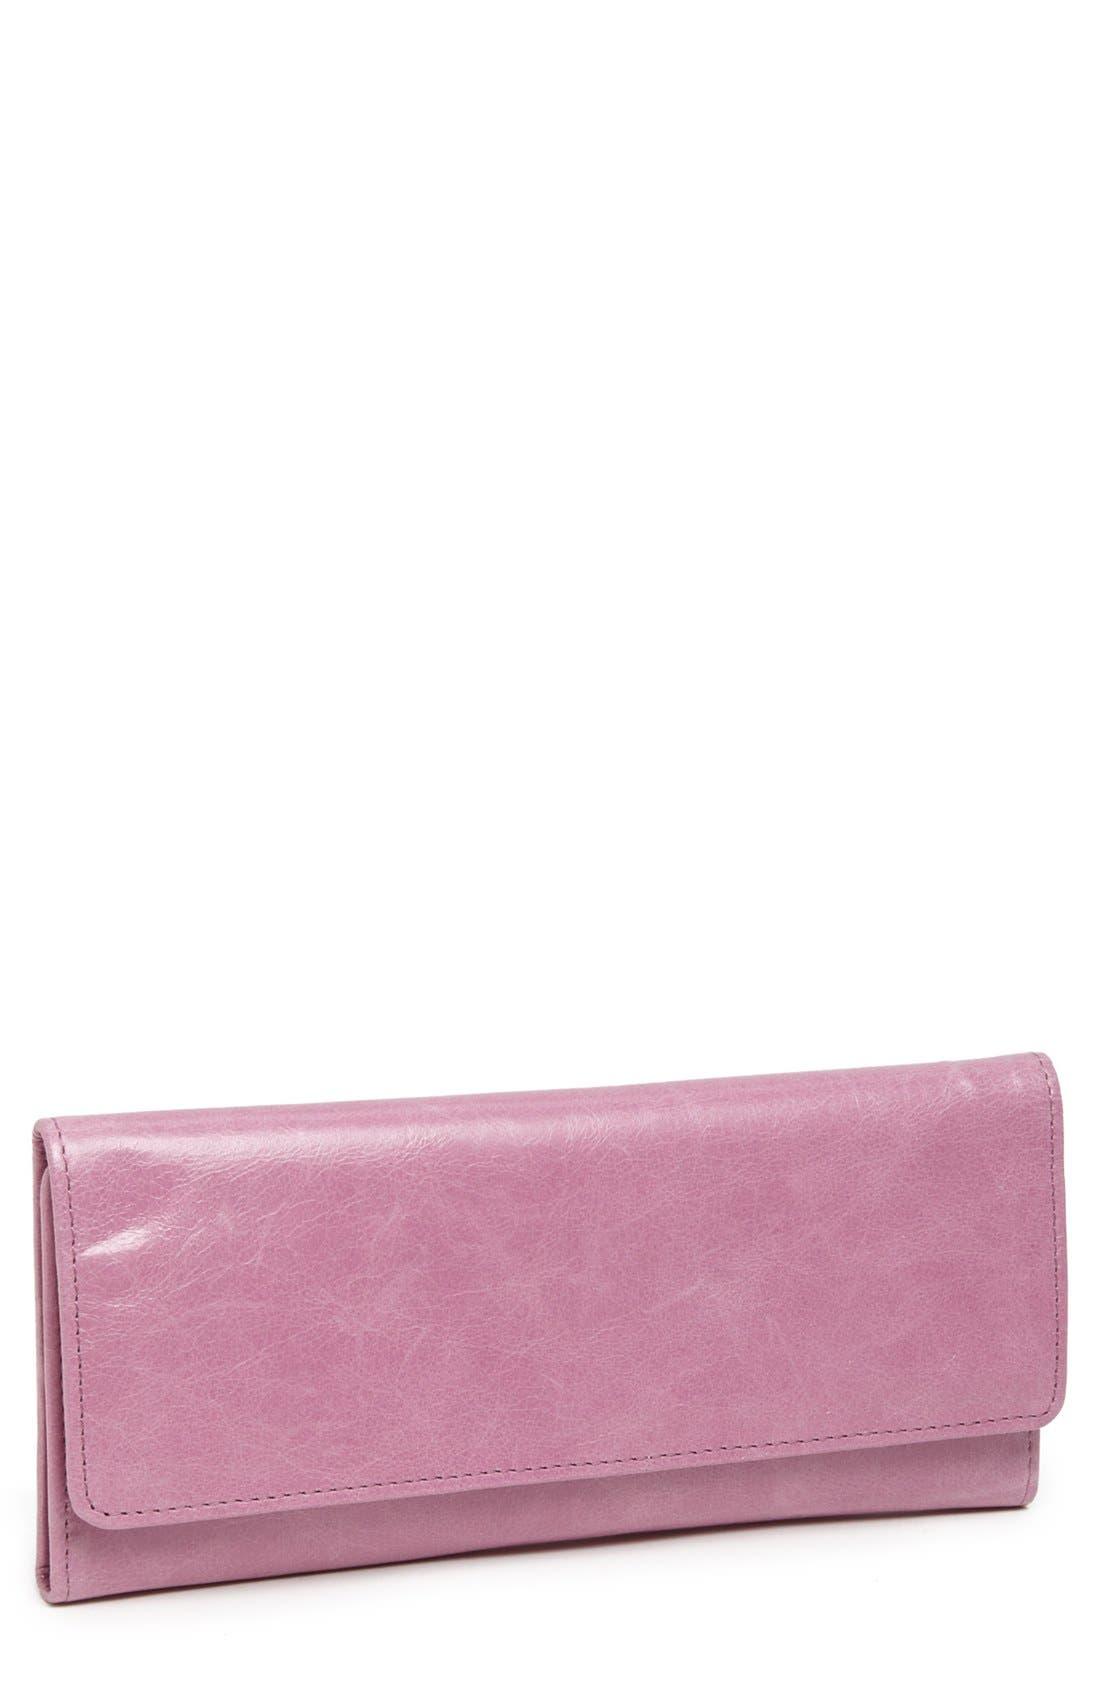 'Sadie' Leather Wallet,                             Main thumbnail 48, color,